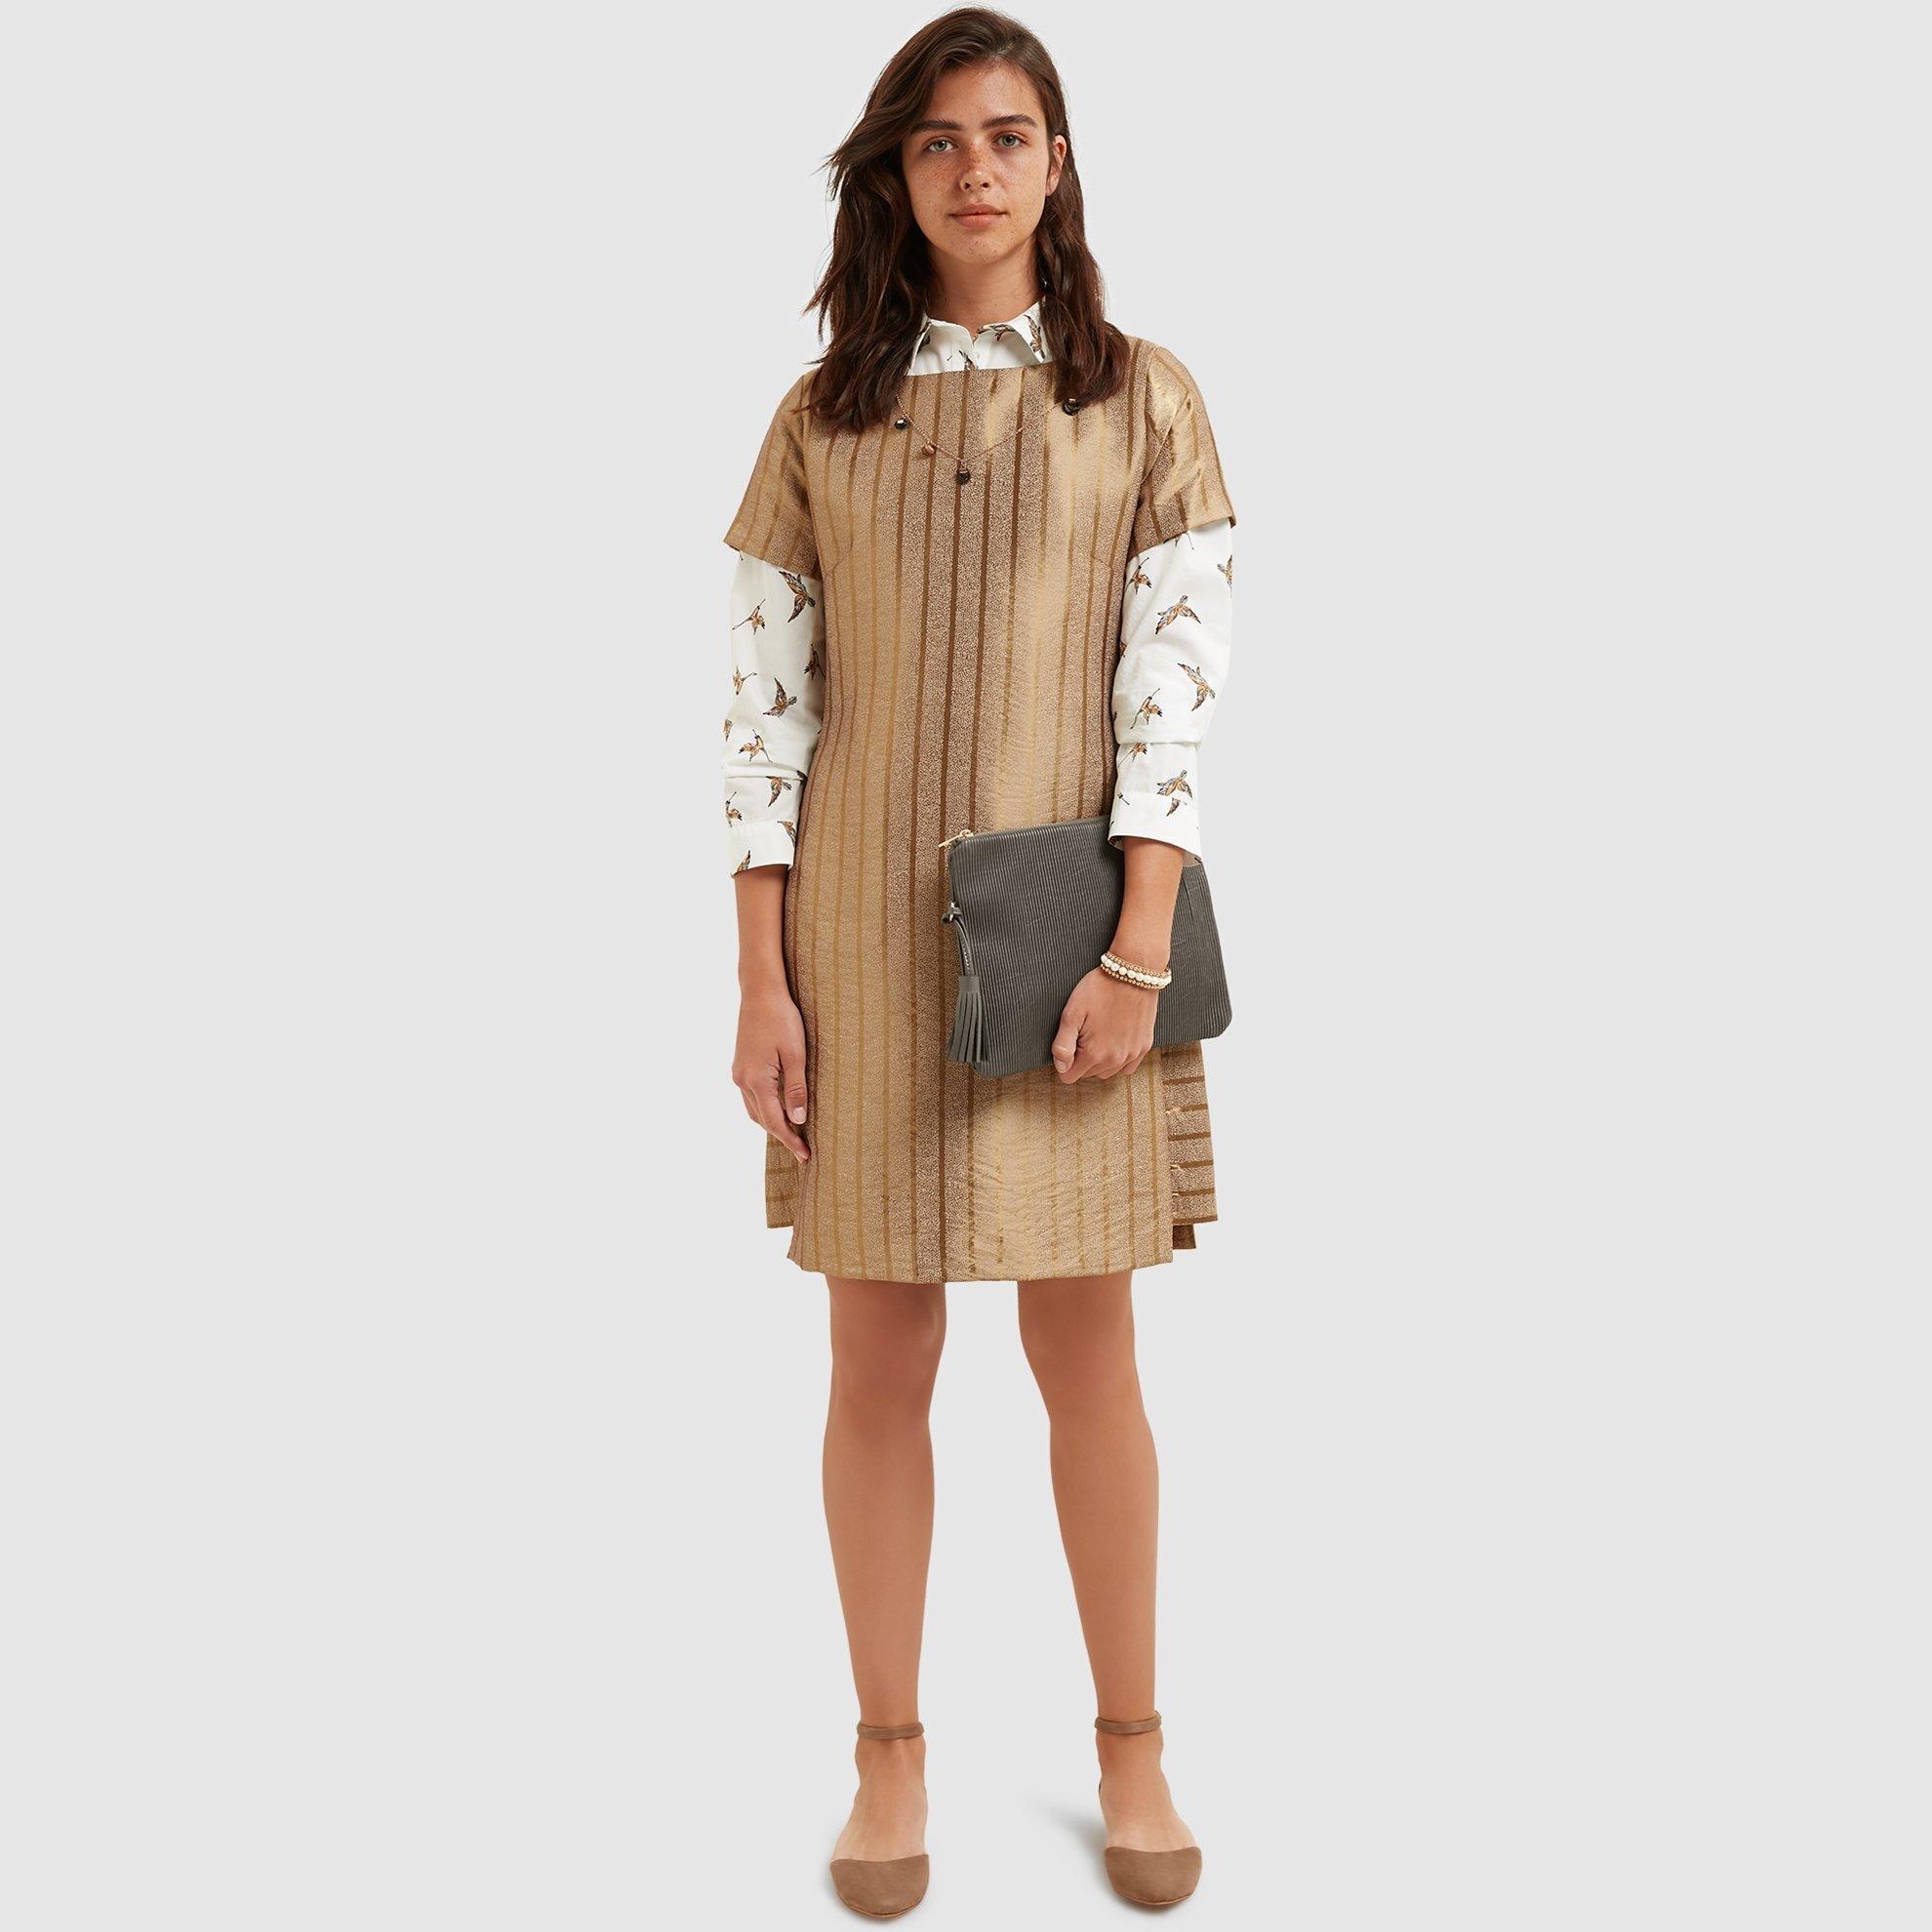 resm Kayık Yaka Elbise